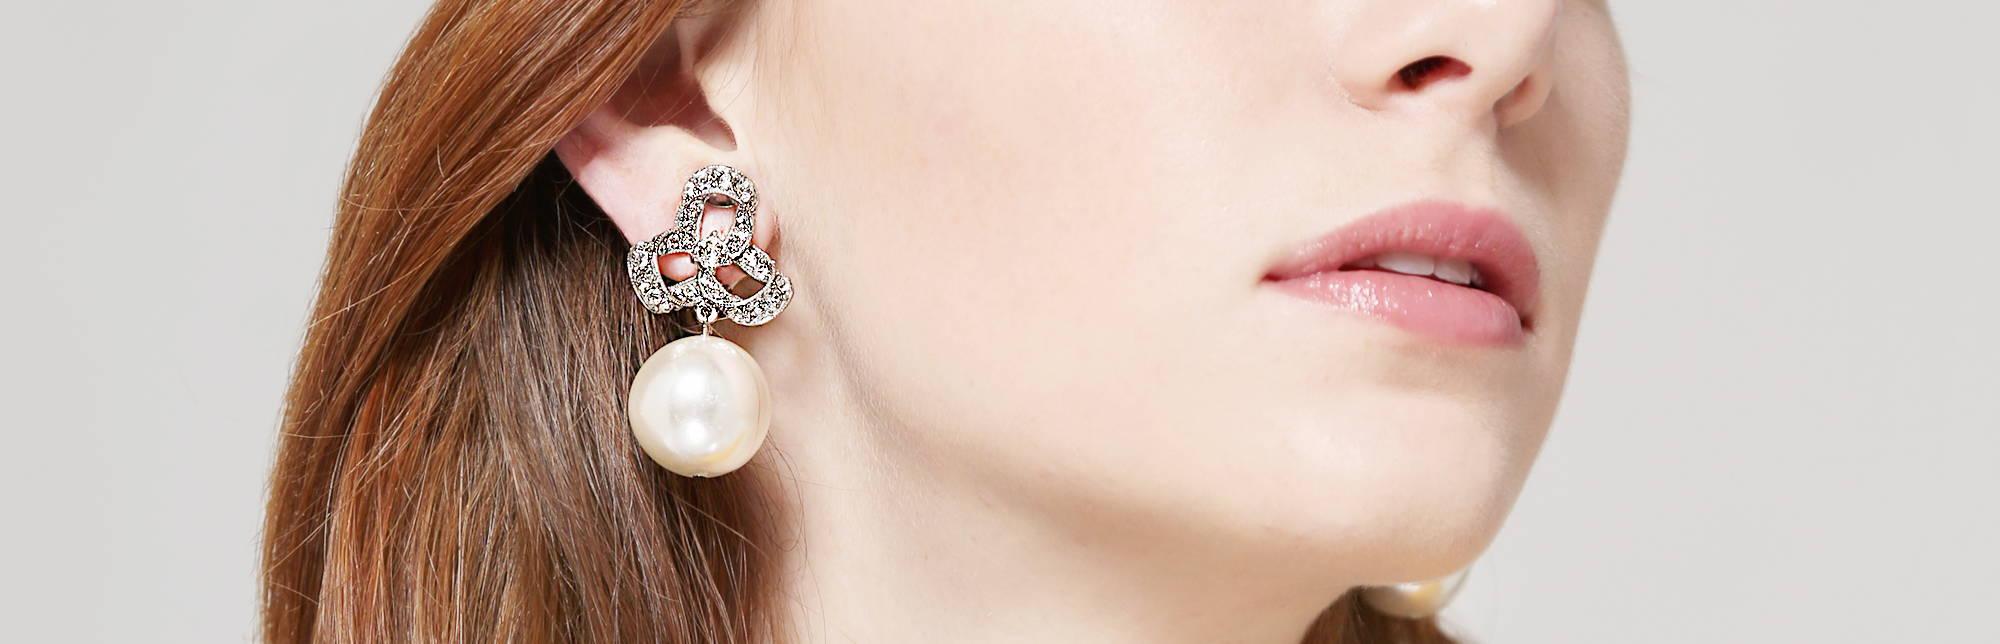 1d81e1a5a2c Earrings